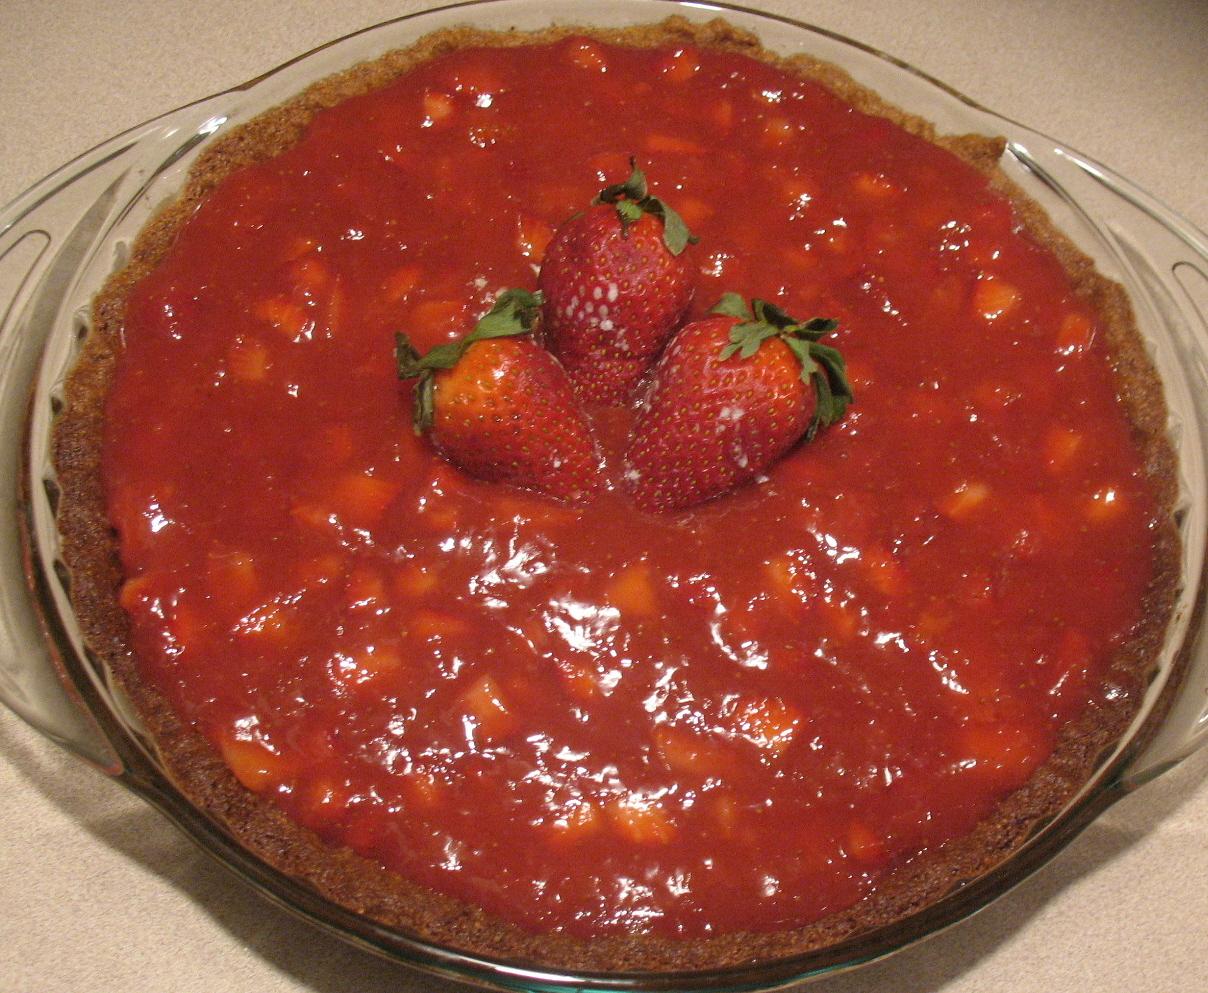 Strawberry Pie with Almond Crust